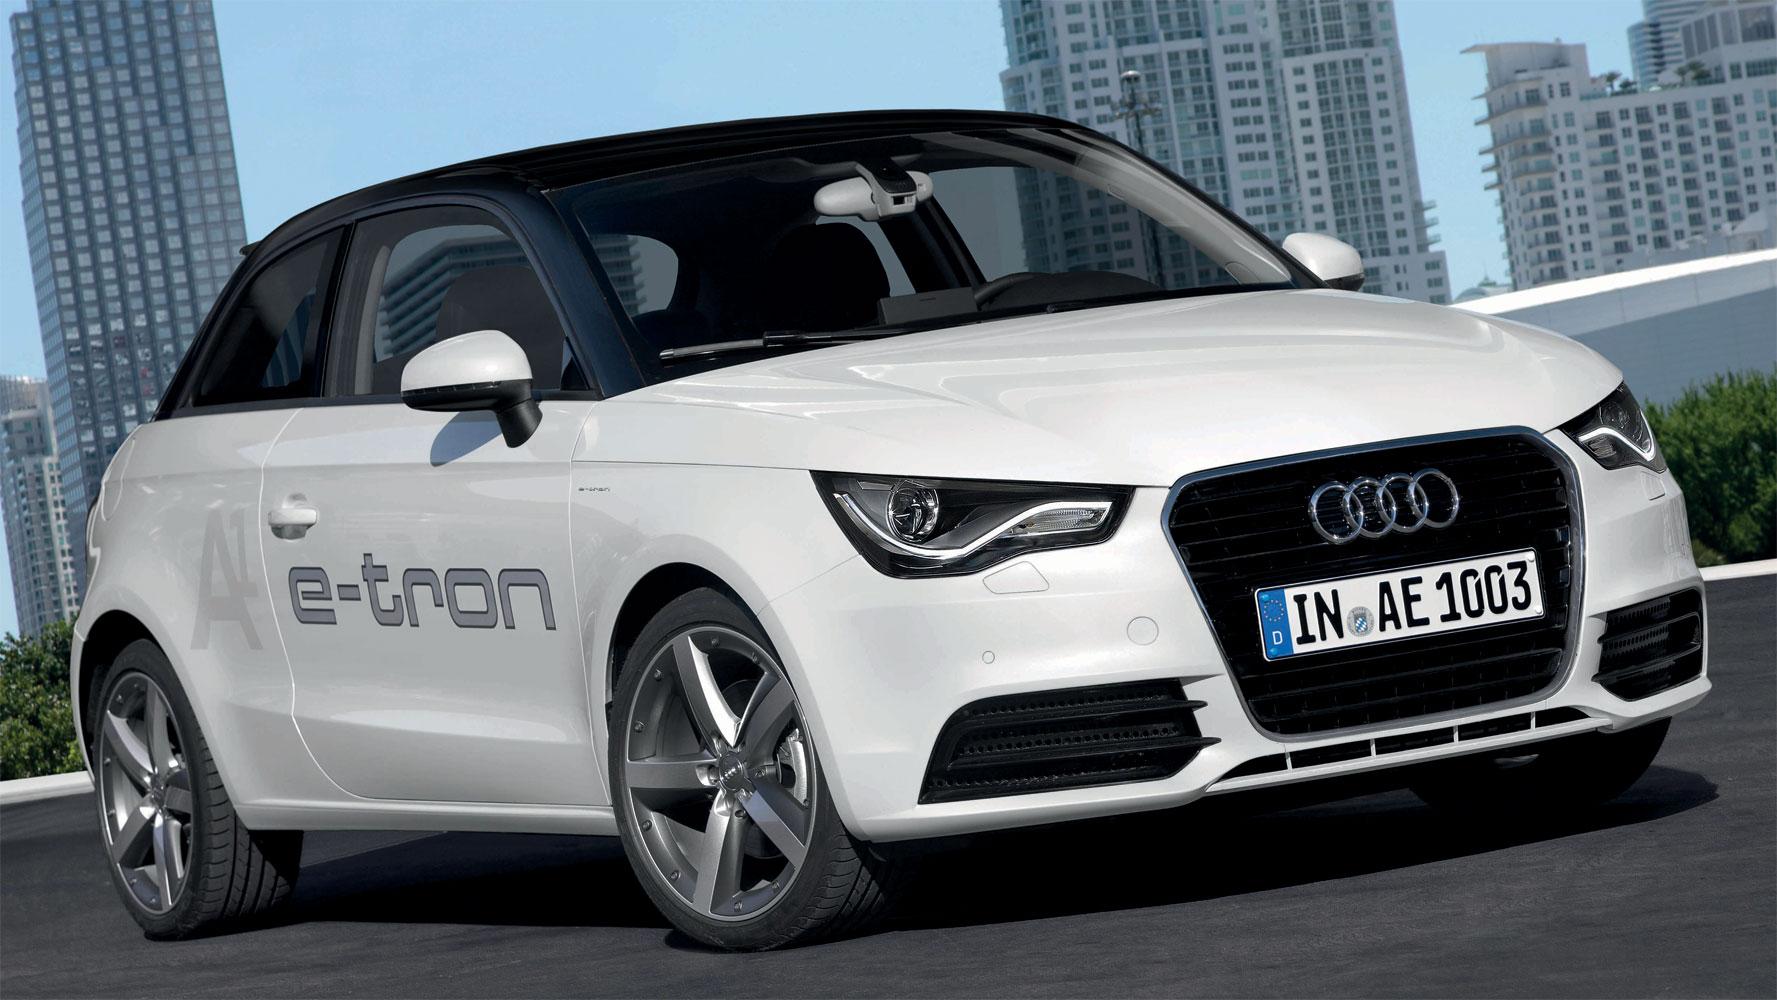 Der Audi A1 e-tron ist tot, es lebe der A1 e-tron Dual-Mode [Video]